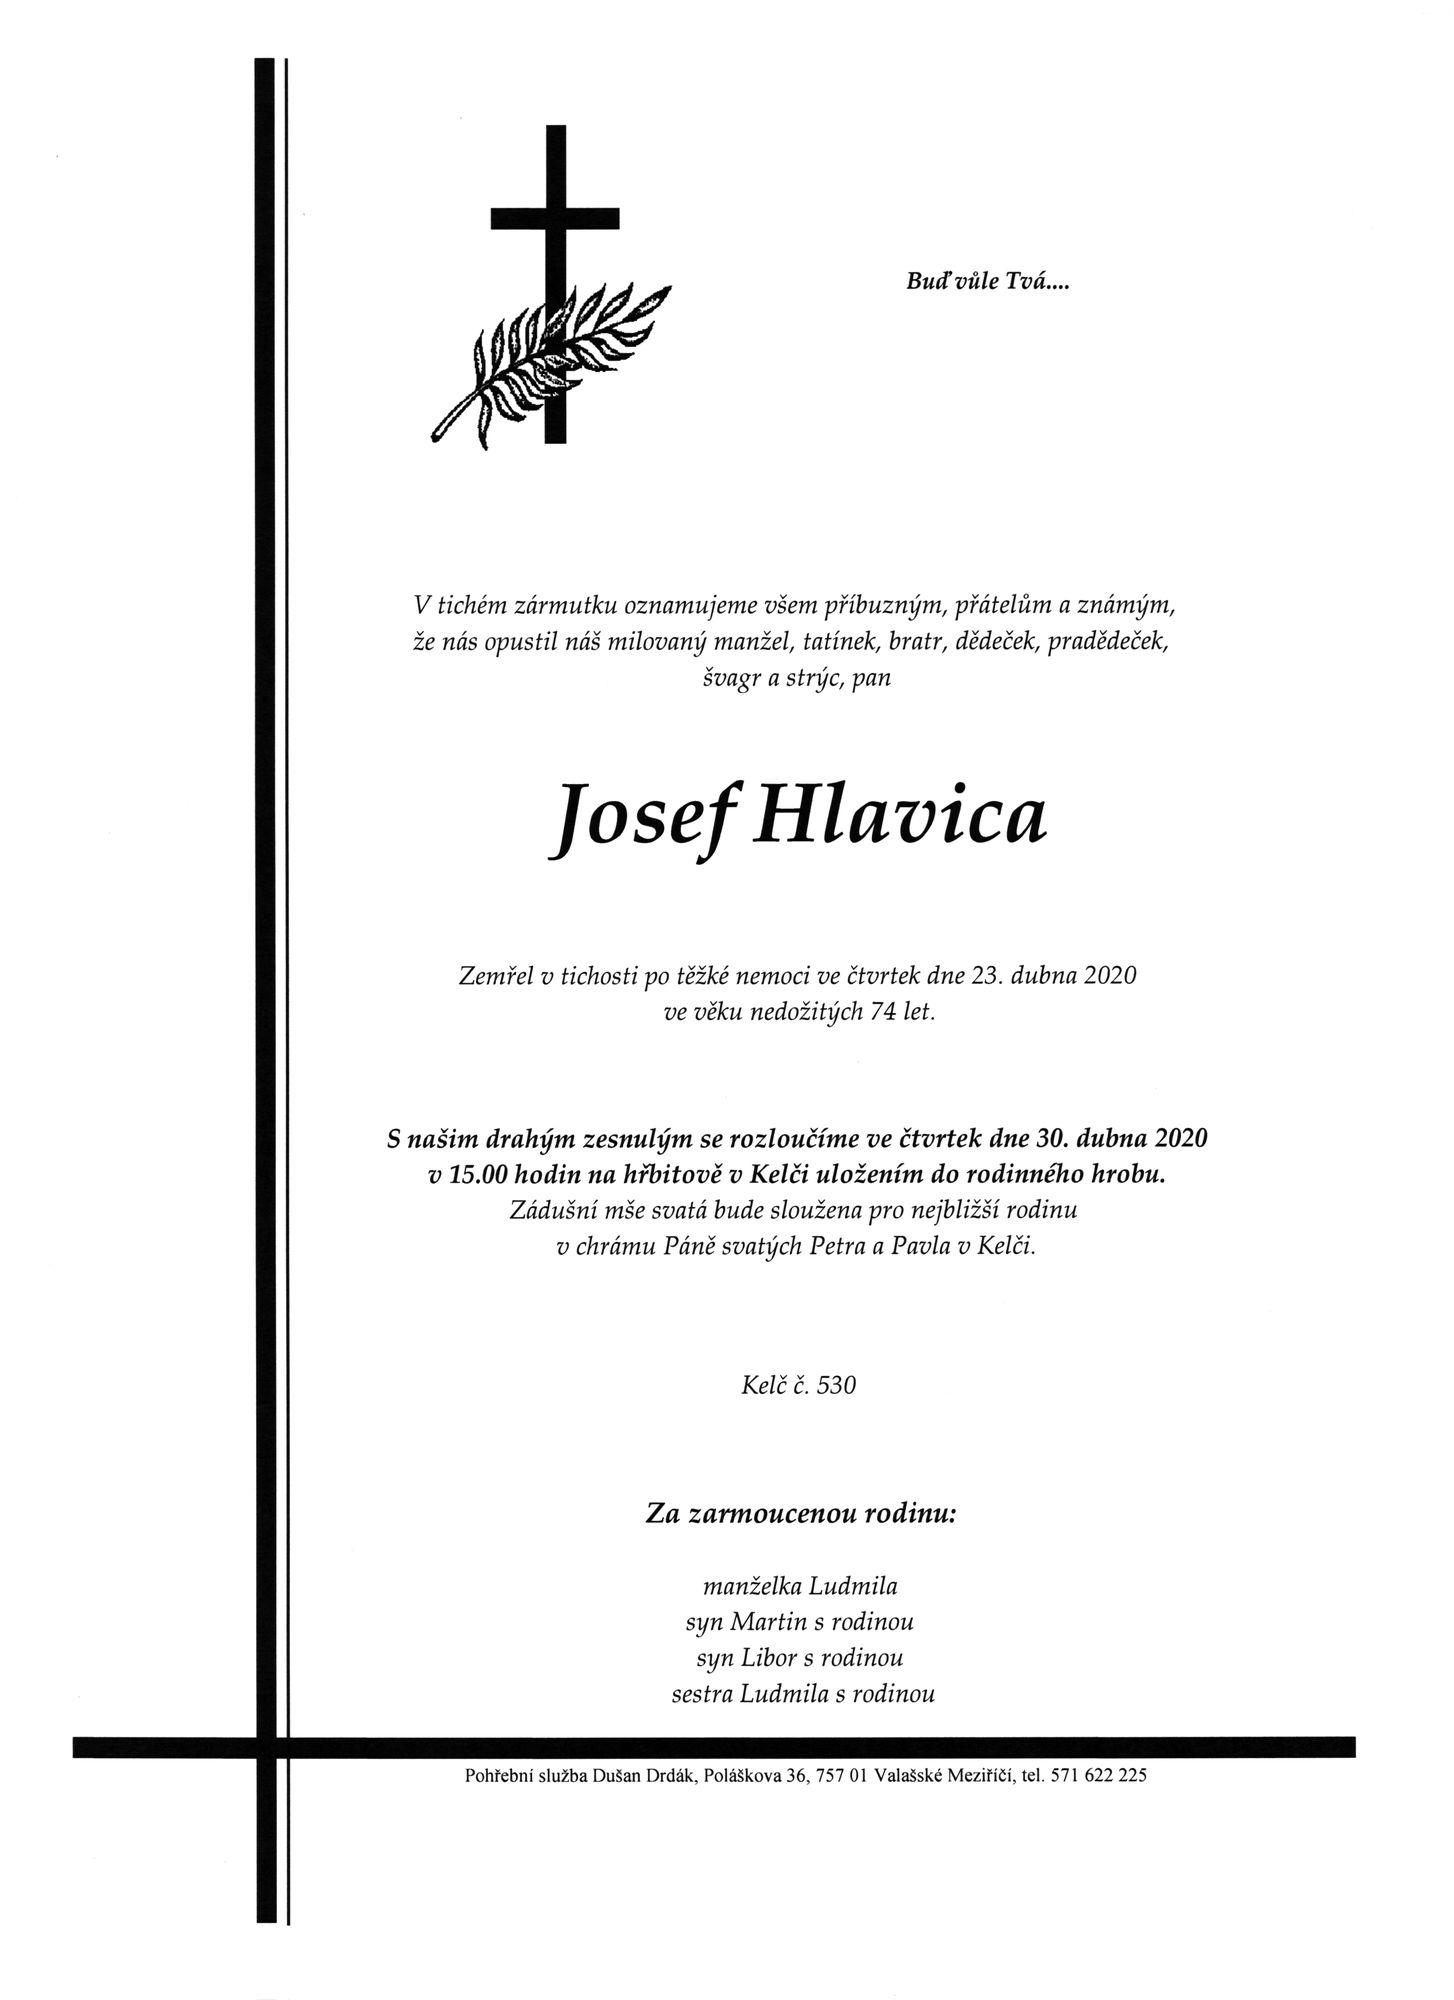 Josef Hlavica